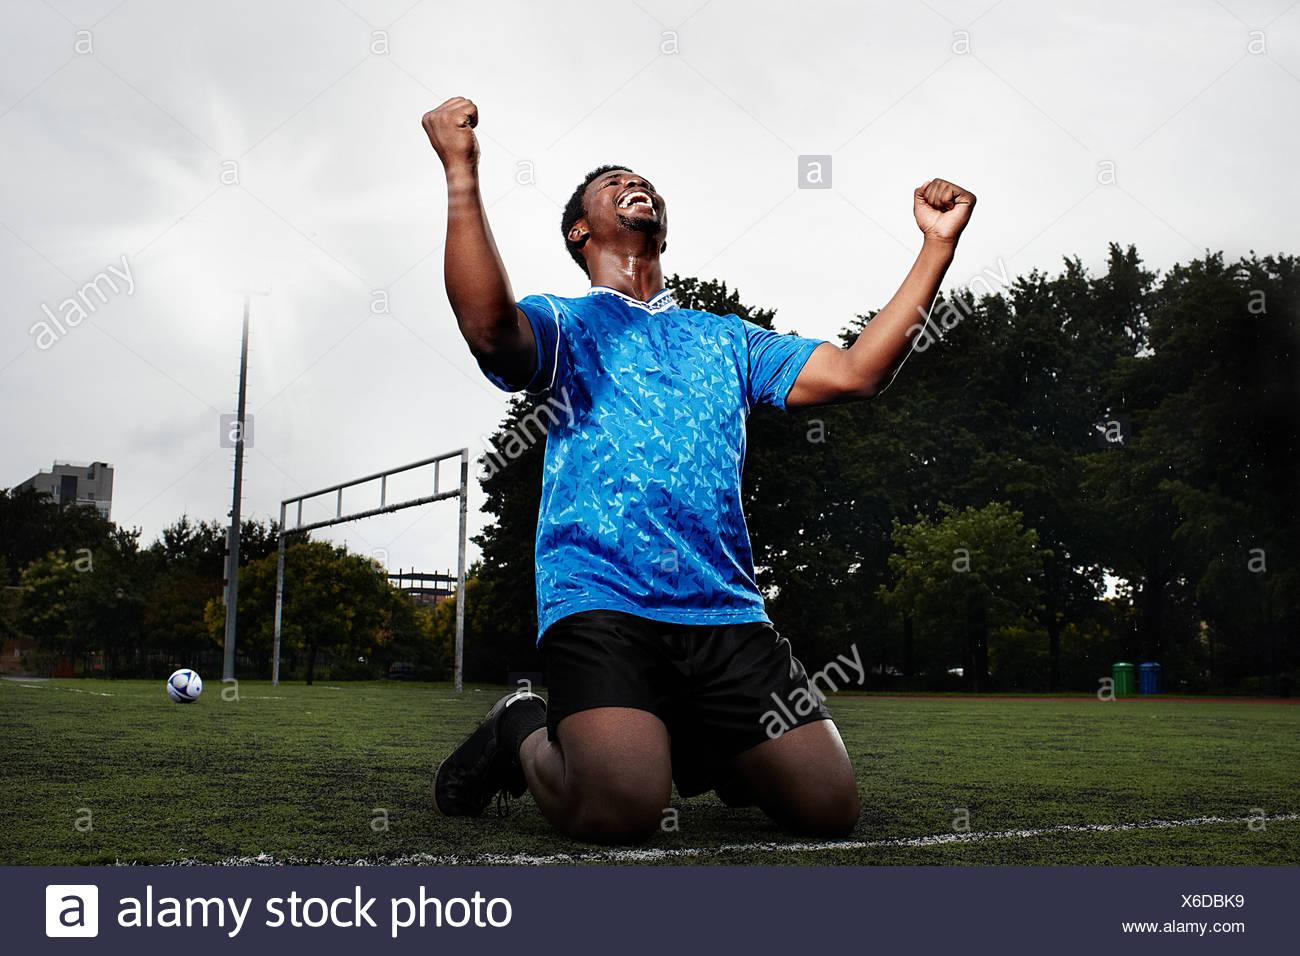 Soccer player celebrating goal - Stock Image